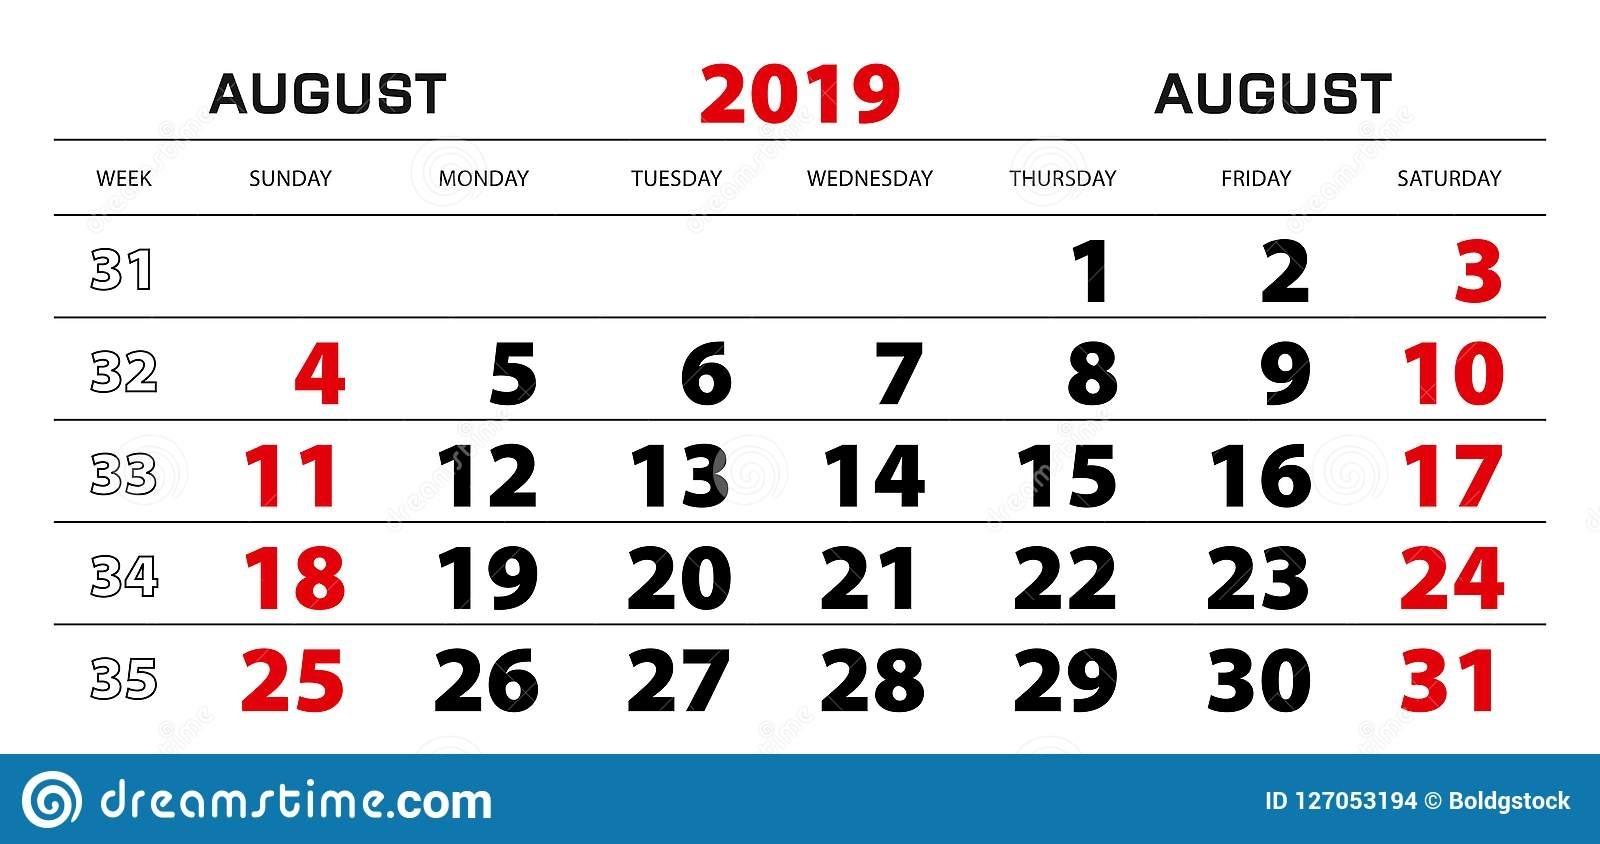 Wall Calendar 2019 For August, Week Start From Sunday. Stock